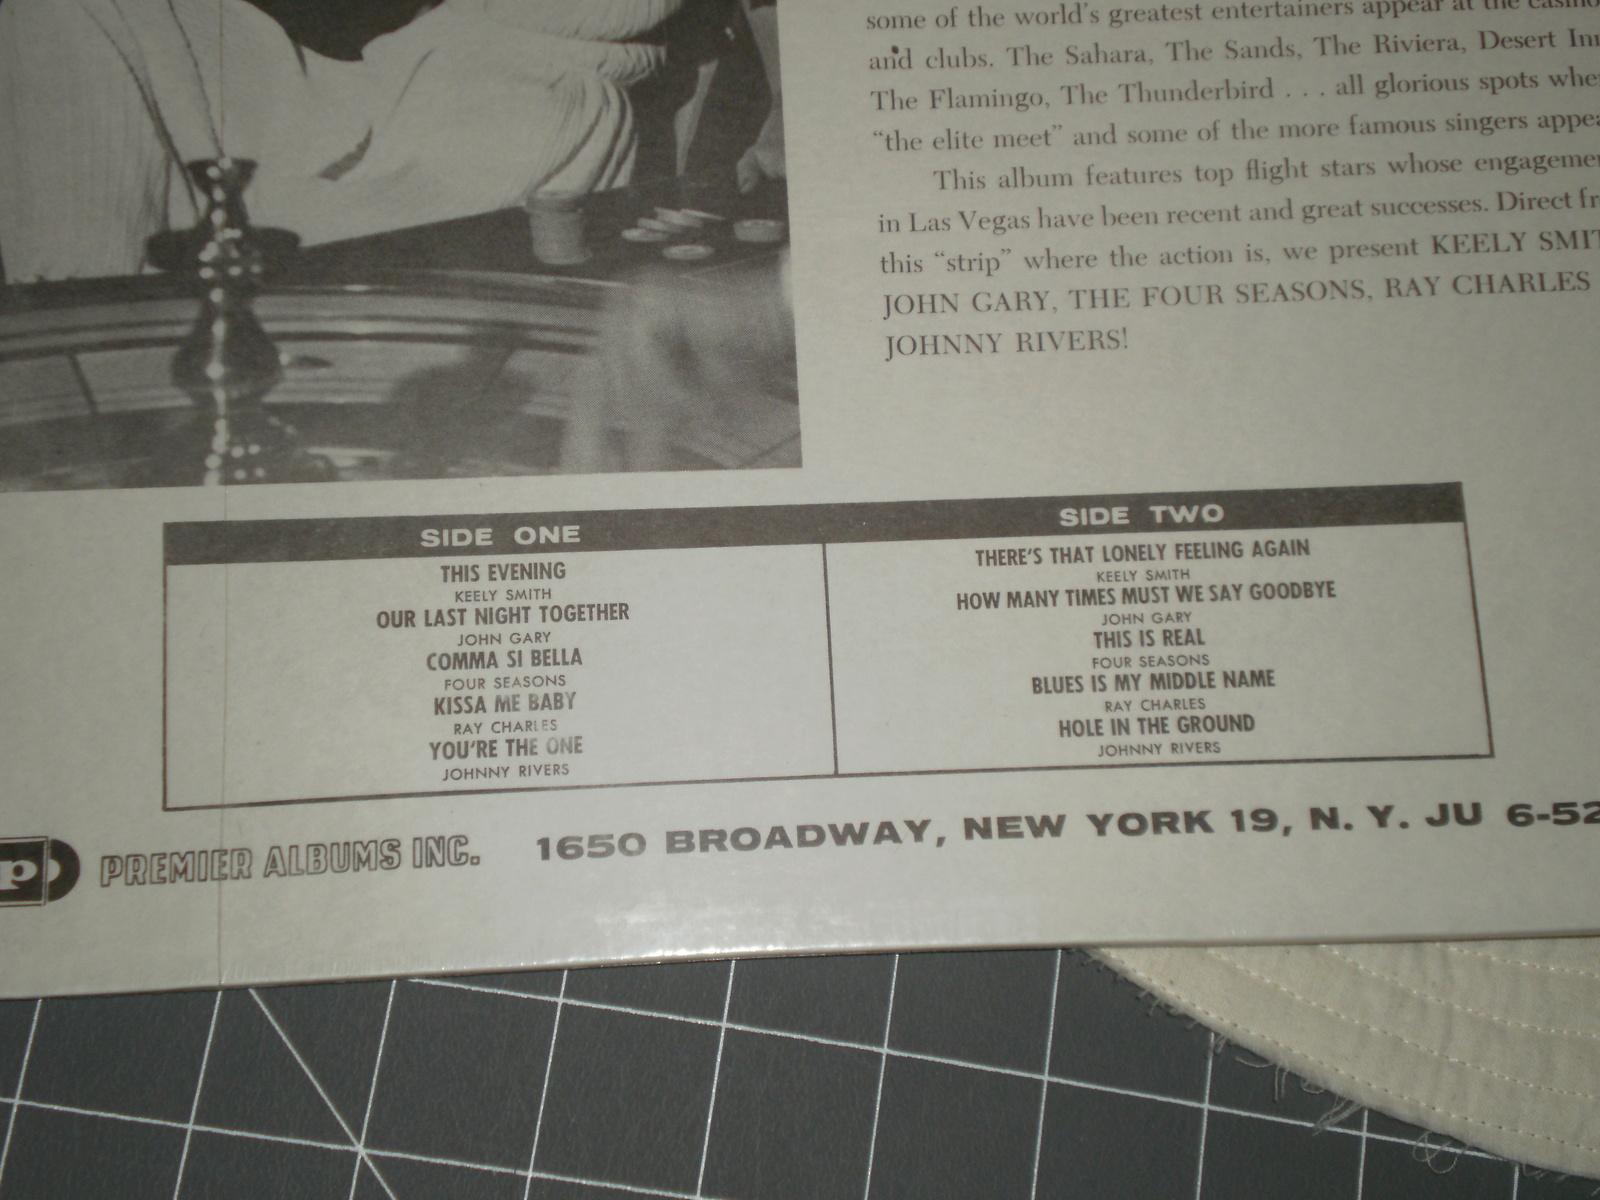 Las Vegas Winners record album various artists Johnny Rivers, Ray Charles,